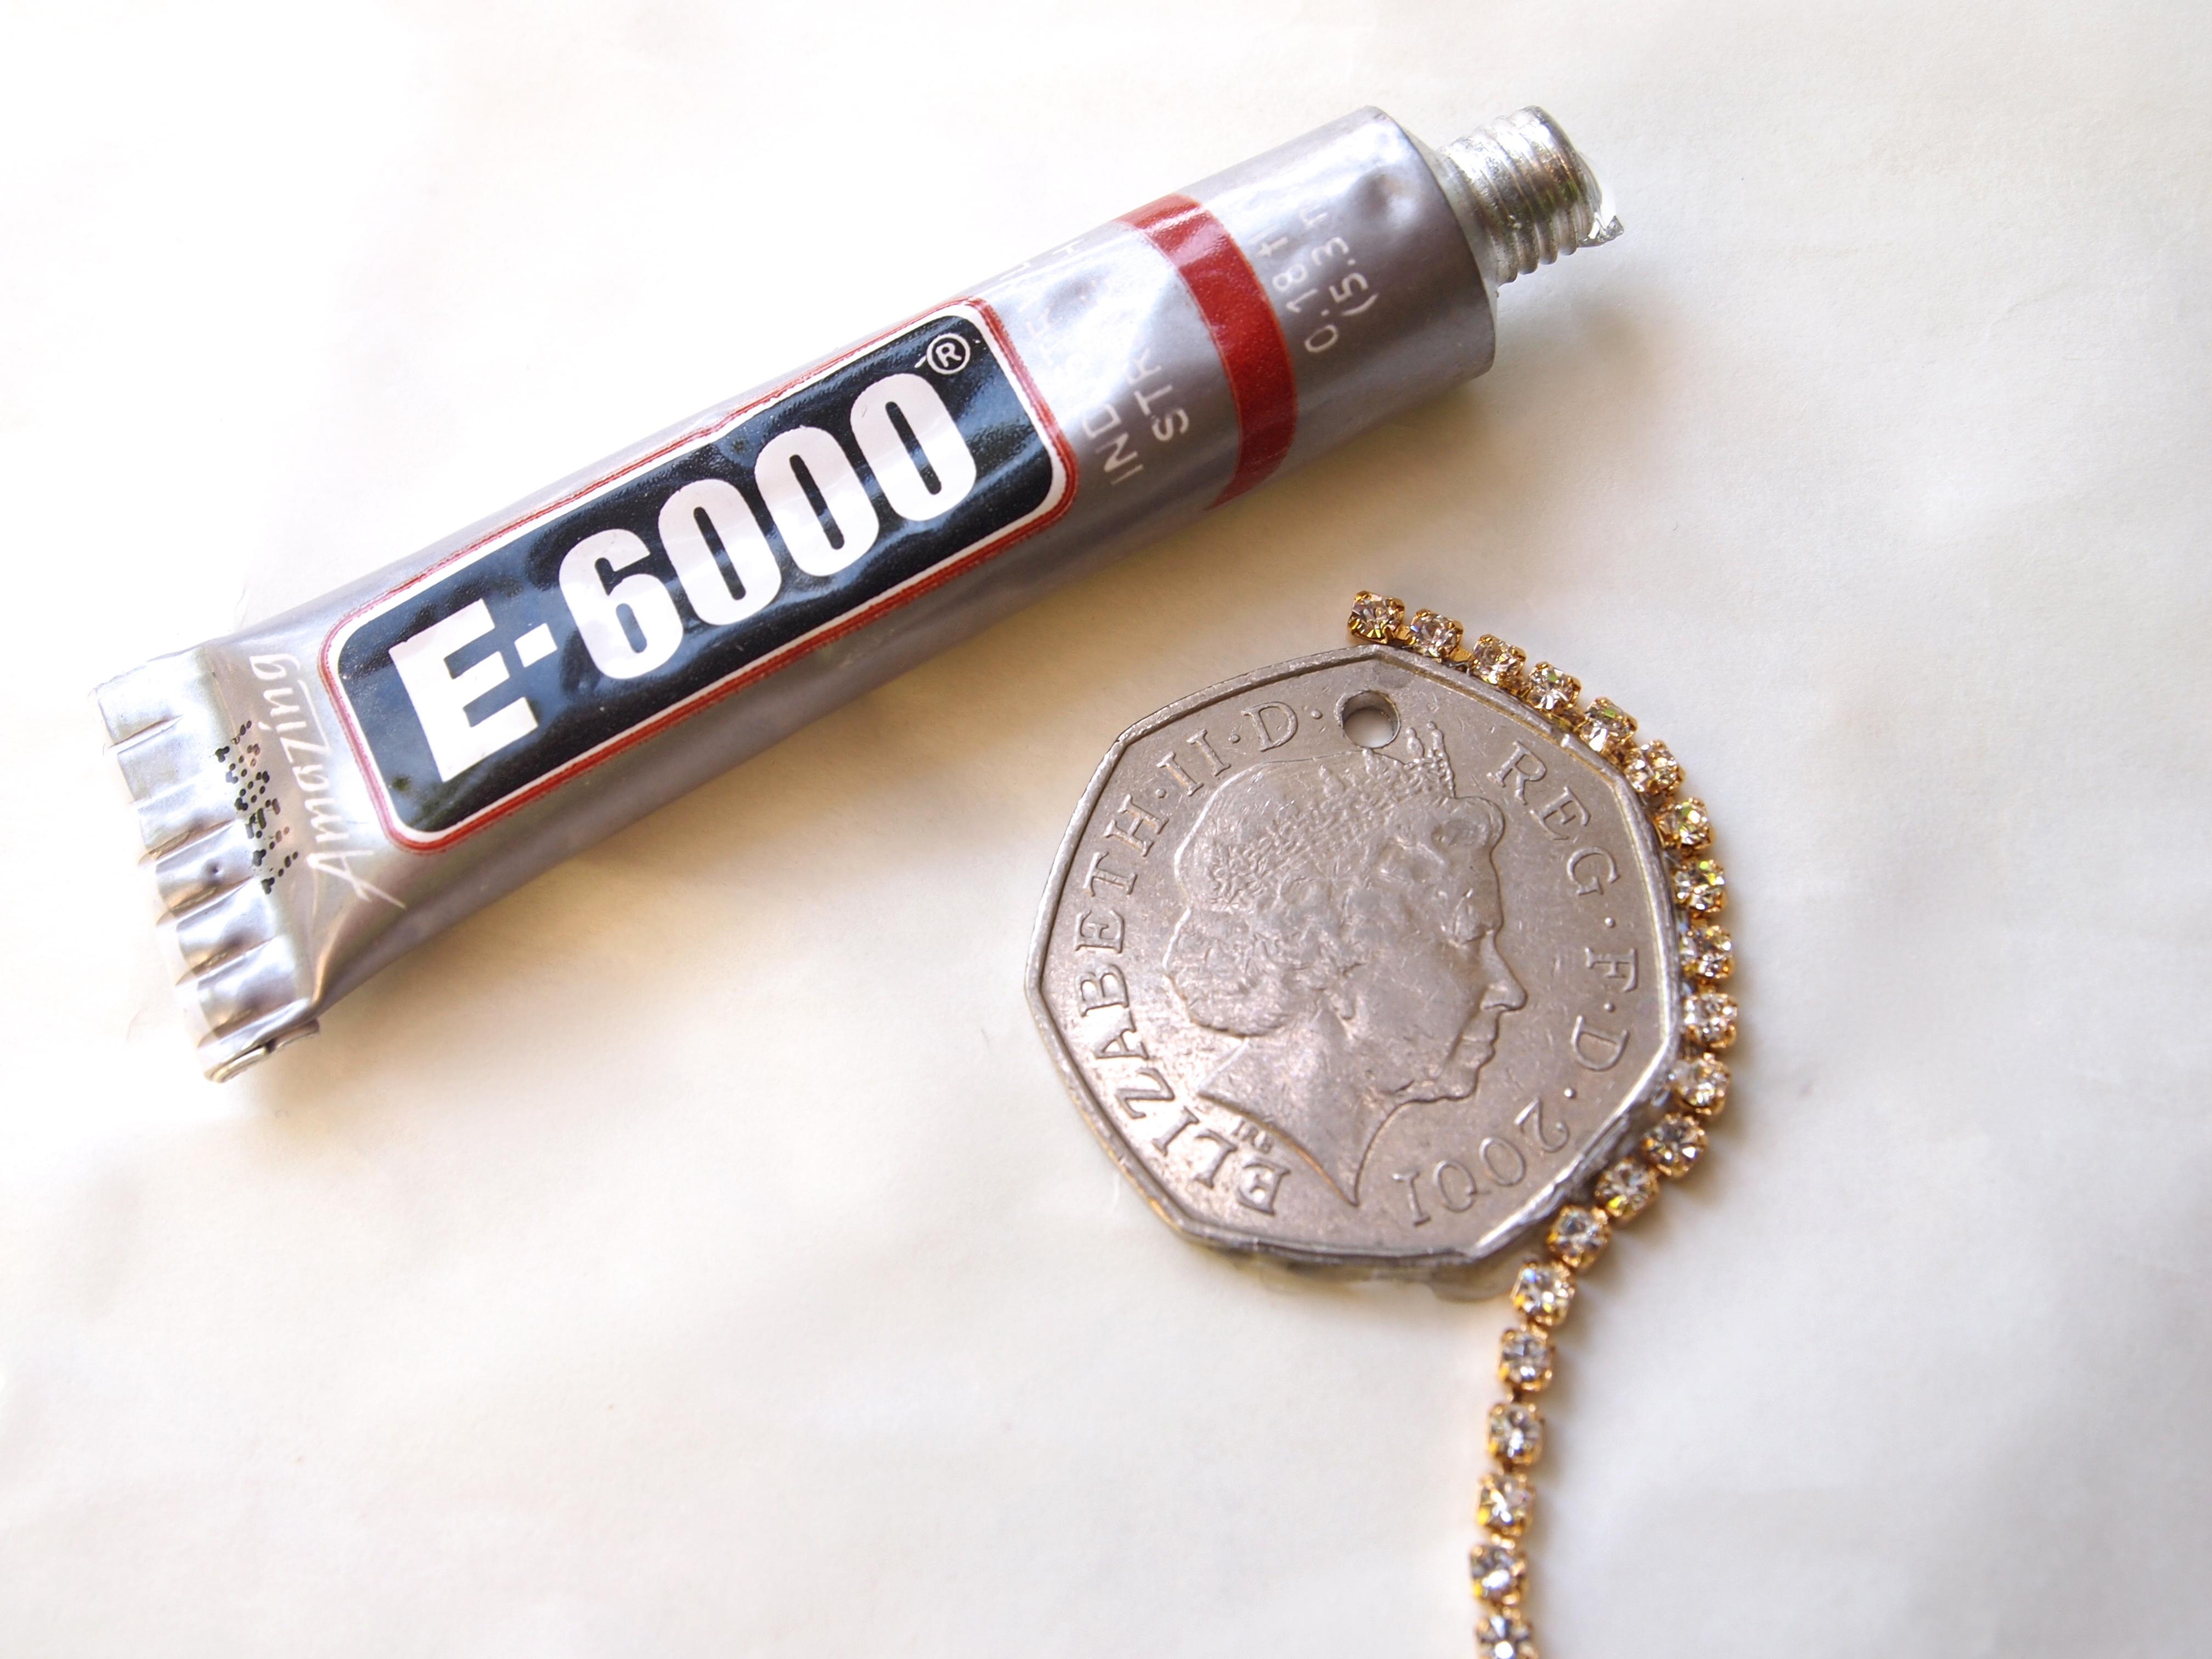 Diy coin n rhinestone pendant necklace glitter n glue diy coin n rhinestone pendant necklace glue aloadofball Gallery